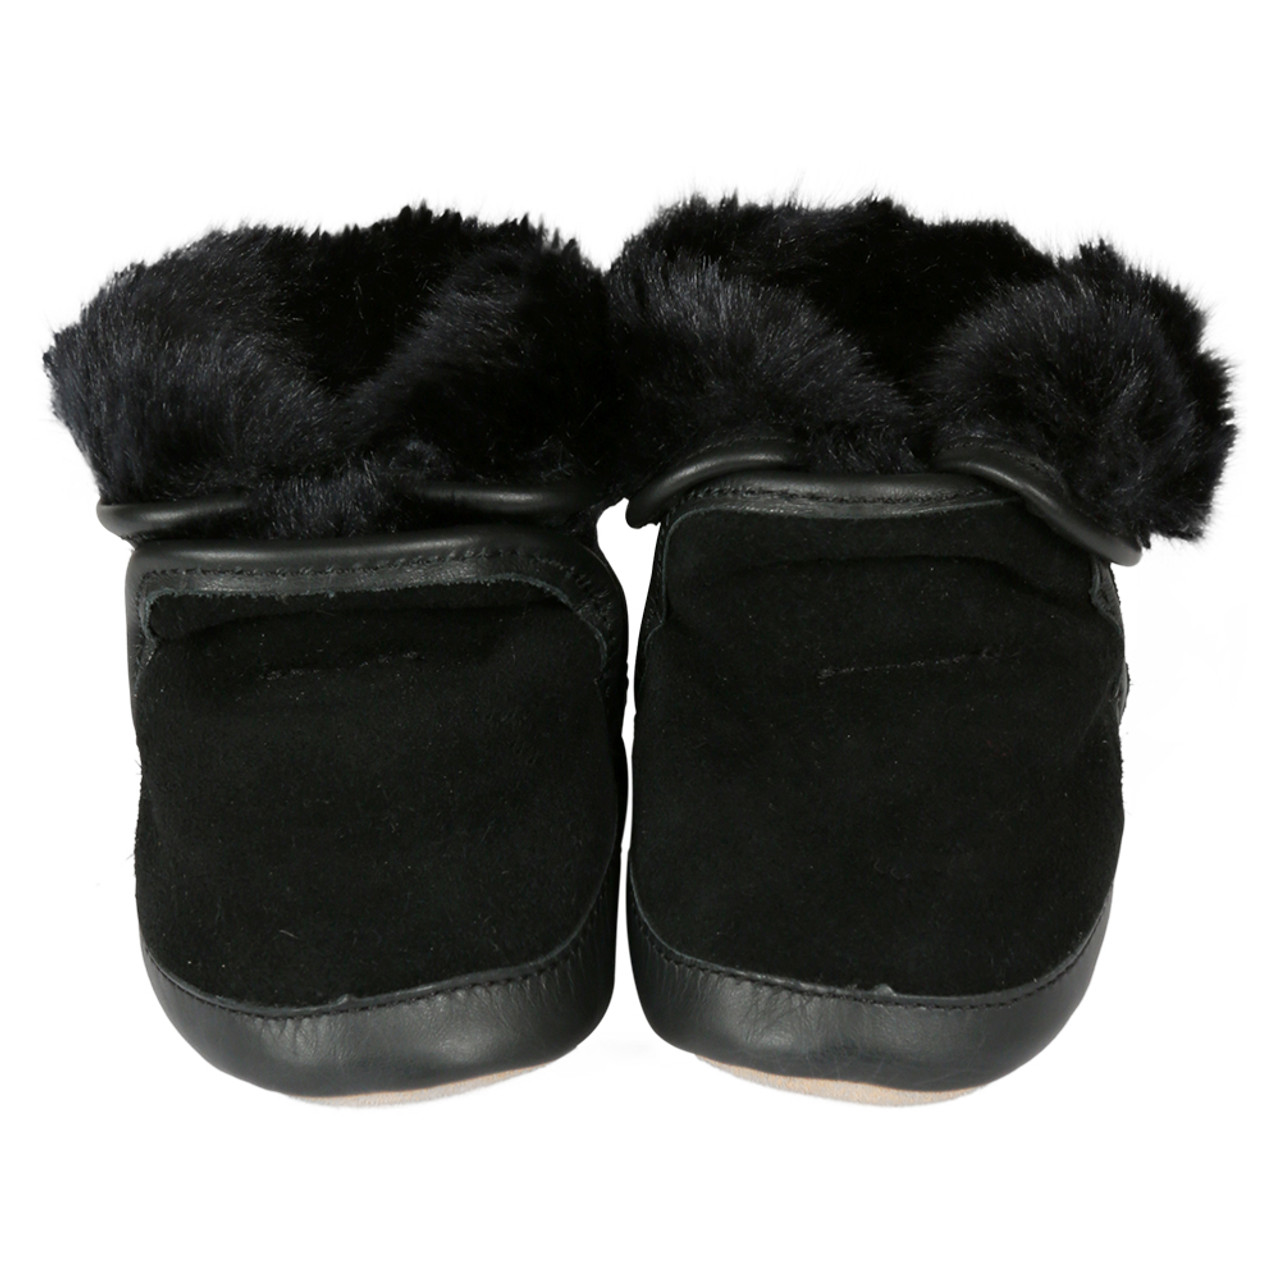 f93a679df69b Robeez Cozy Ankle Boots Black Soft Soles